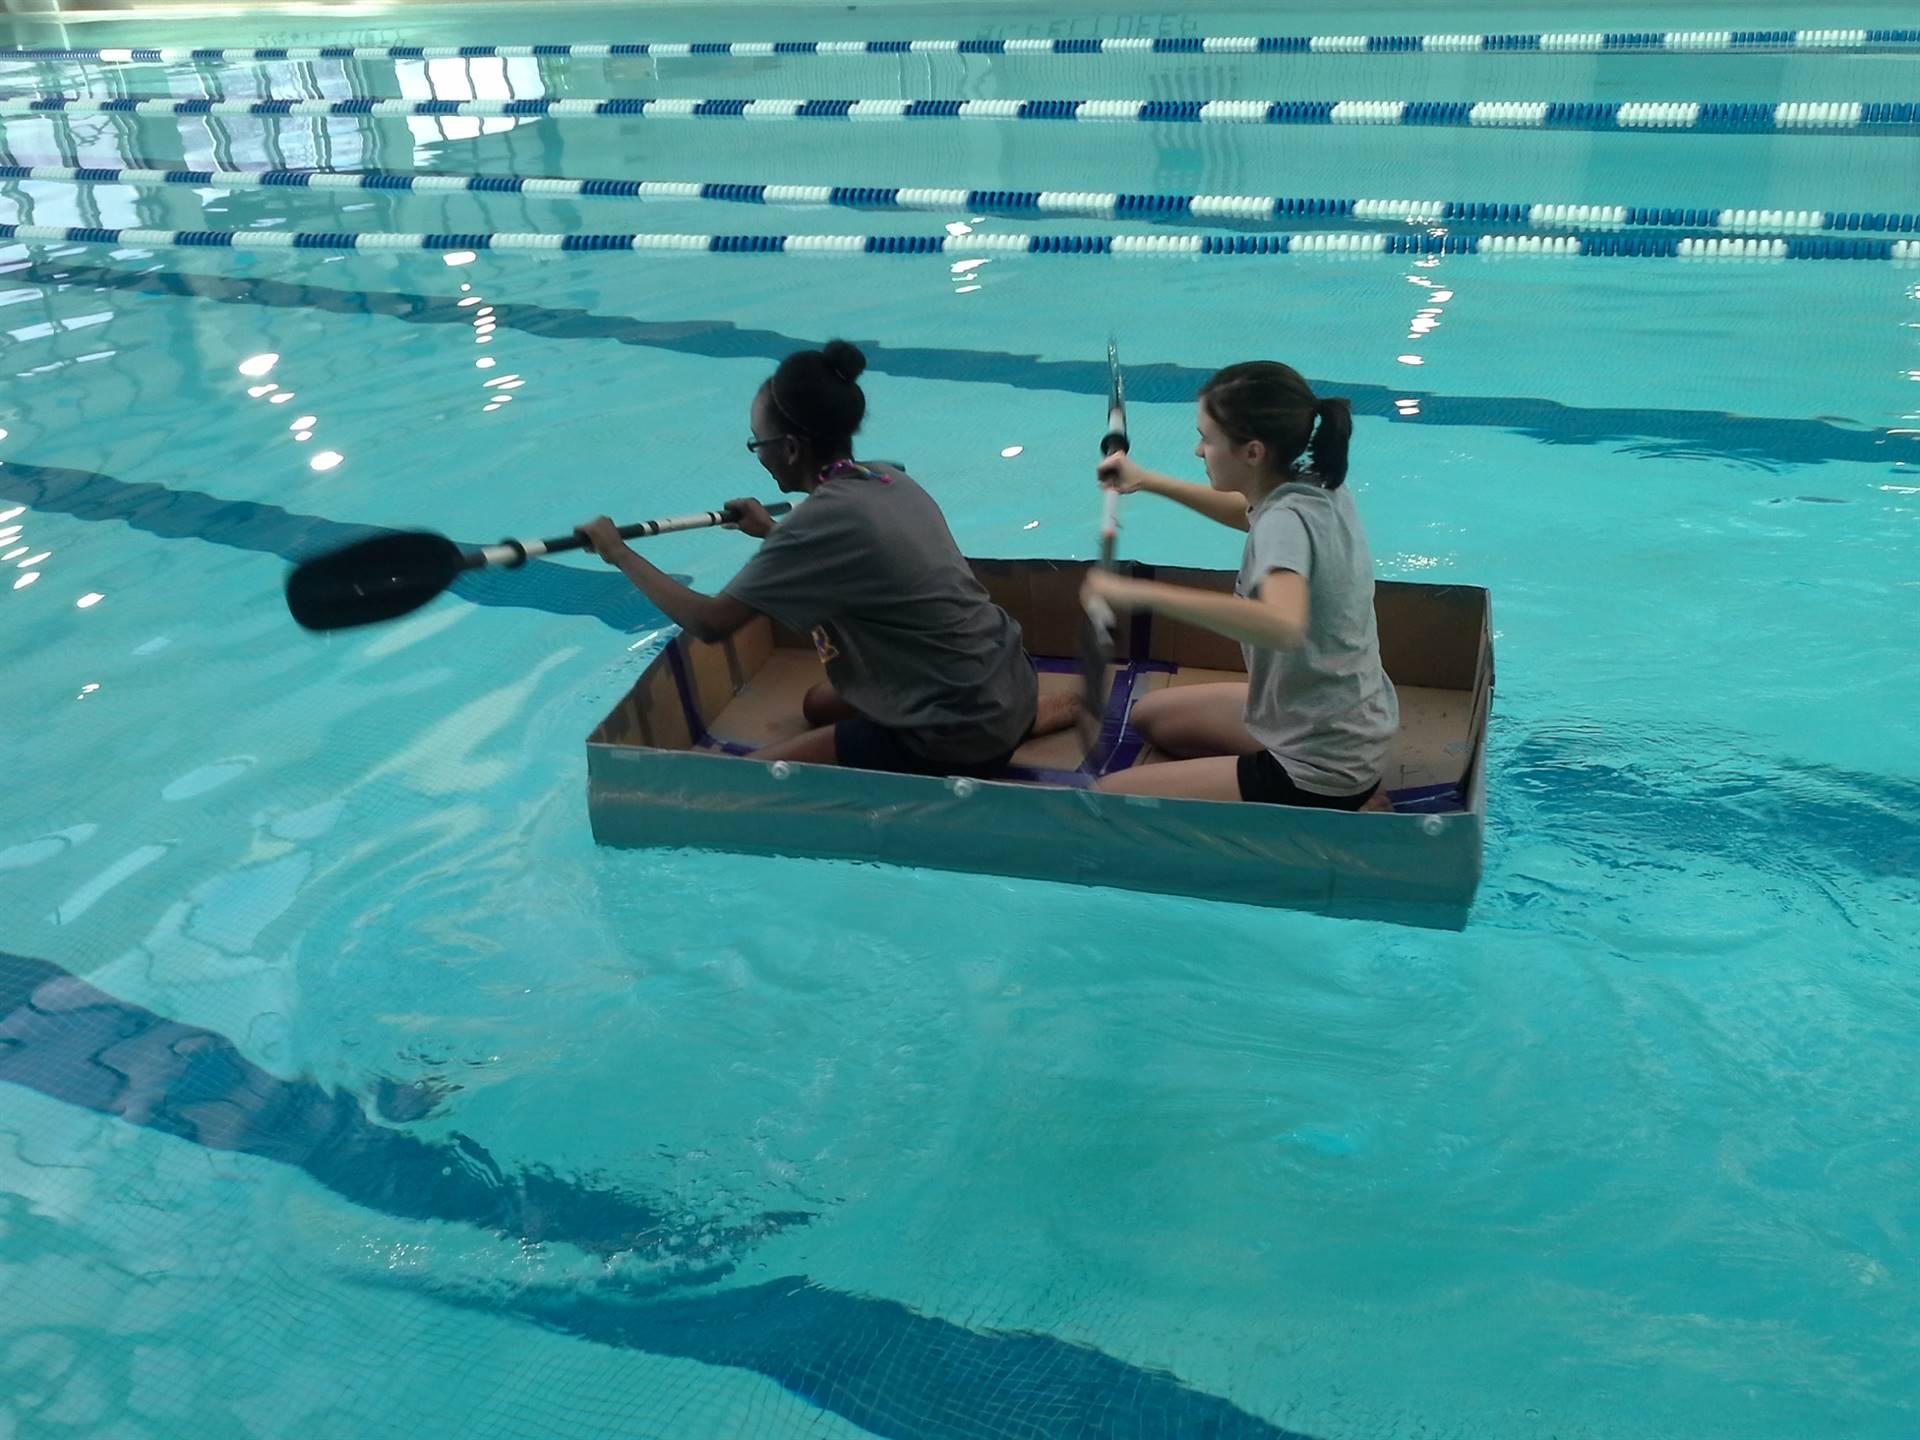 Cardboard Boat Testing